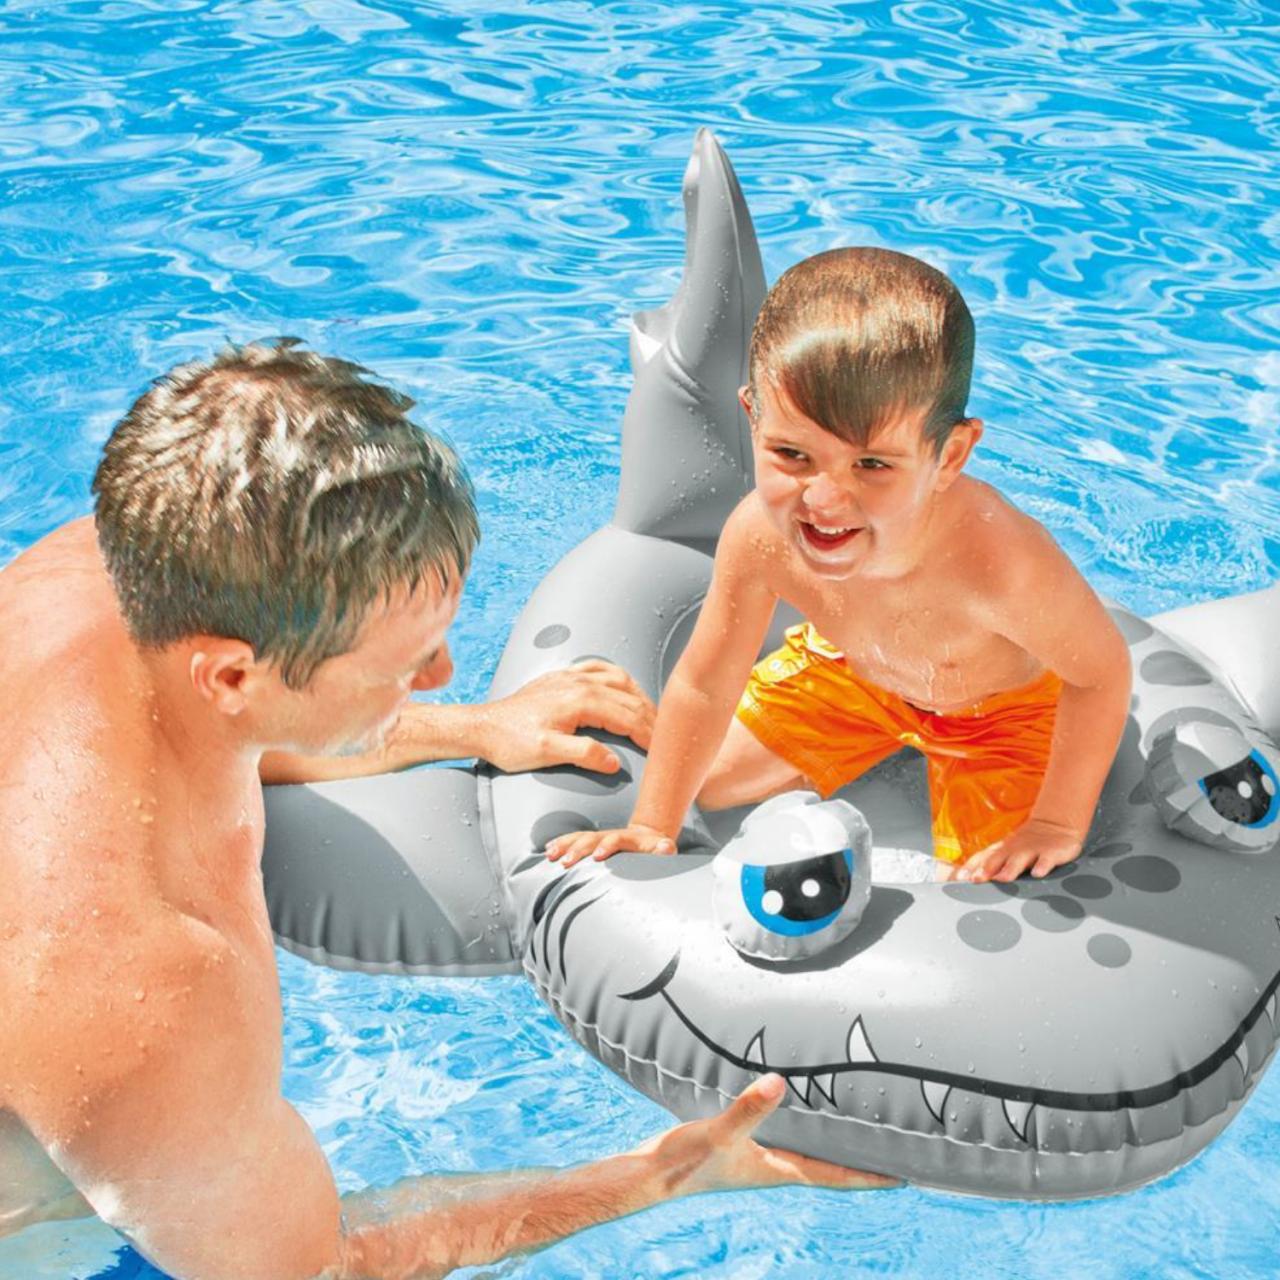 Intex Pool-Cruiser Boot, verfügbar in 3 verschiedenen Designs